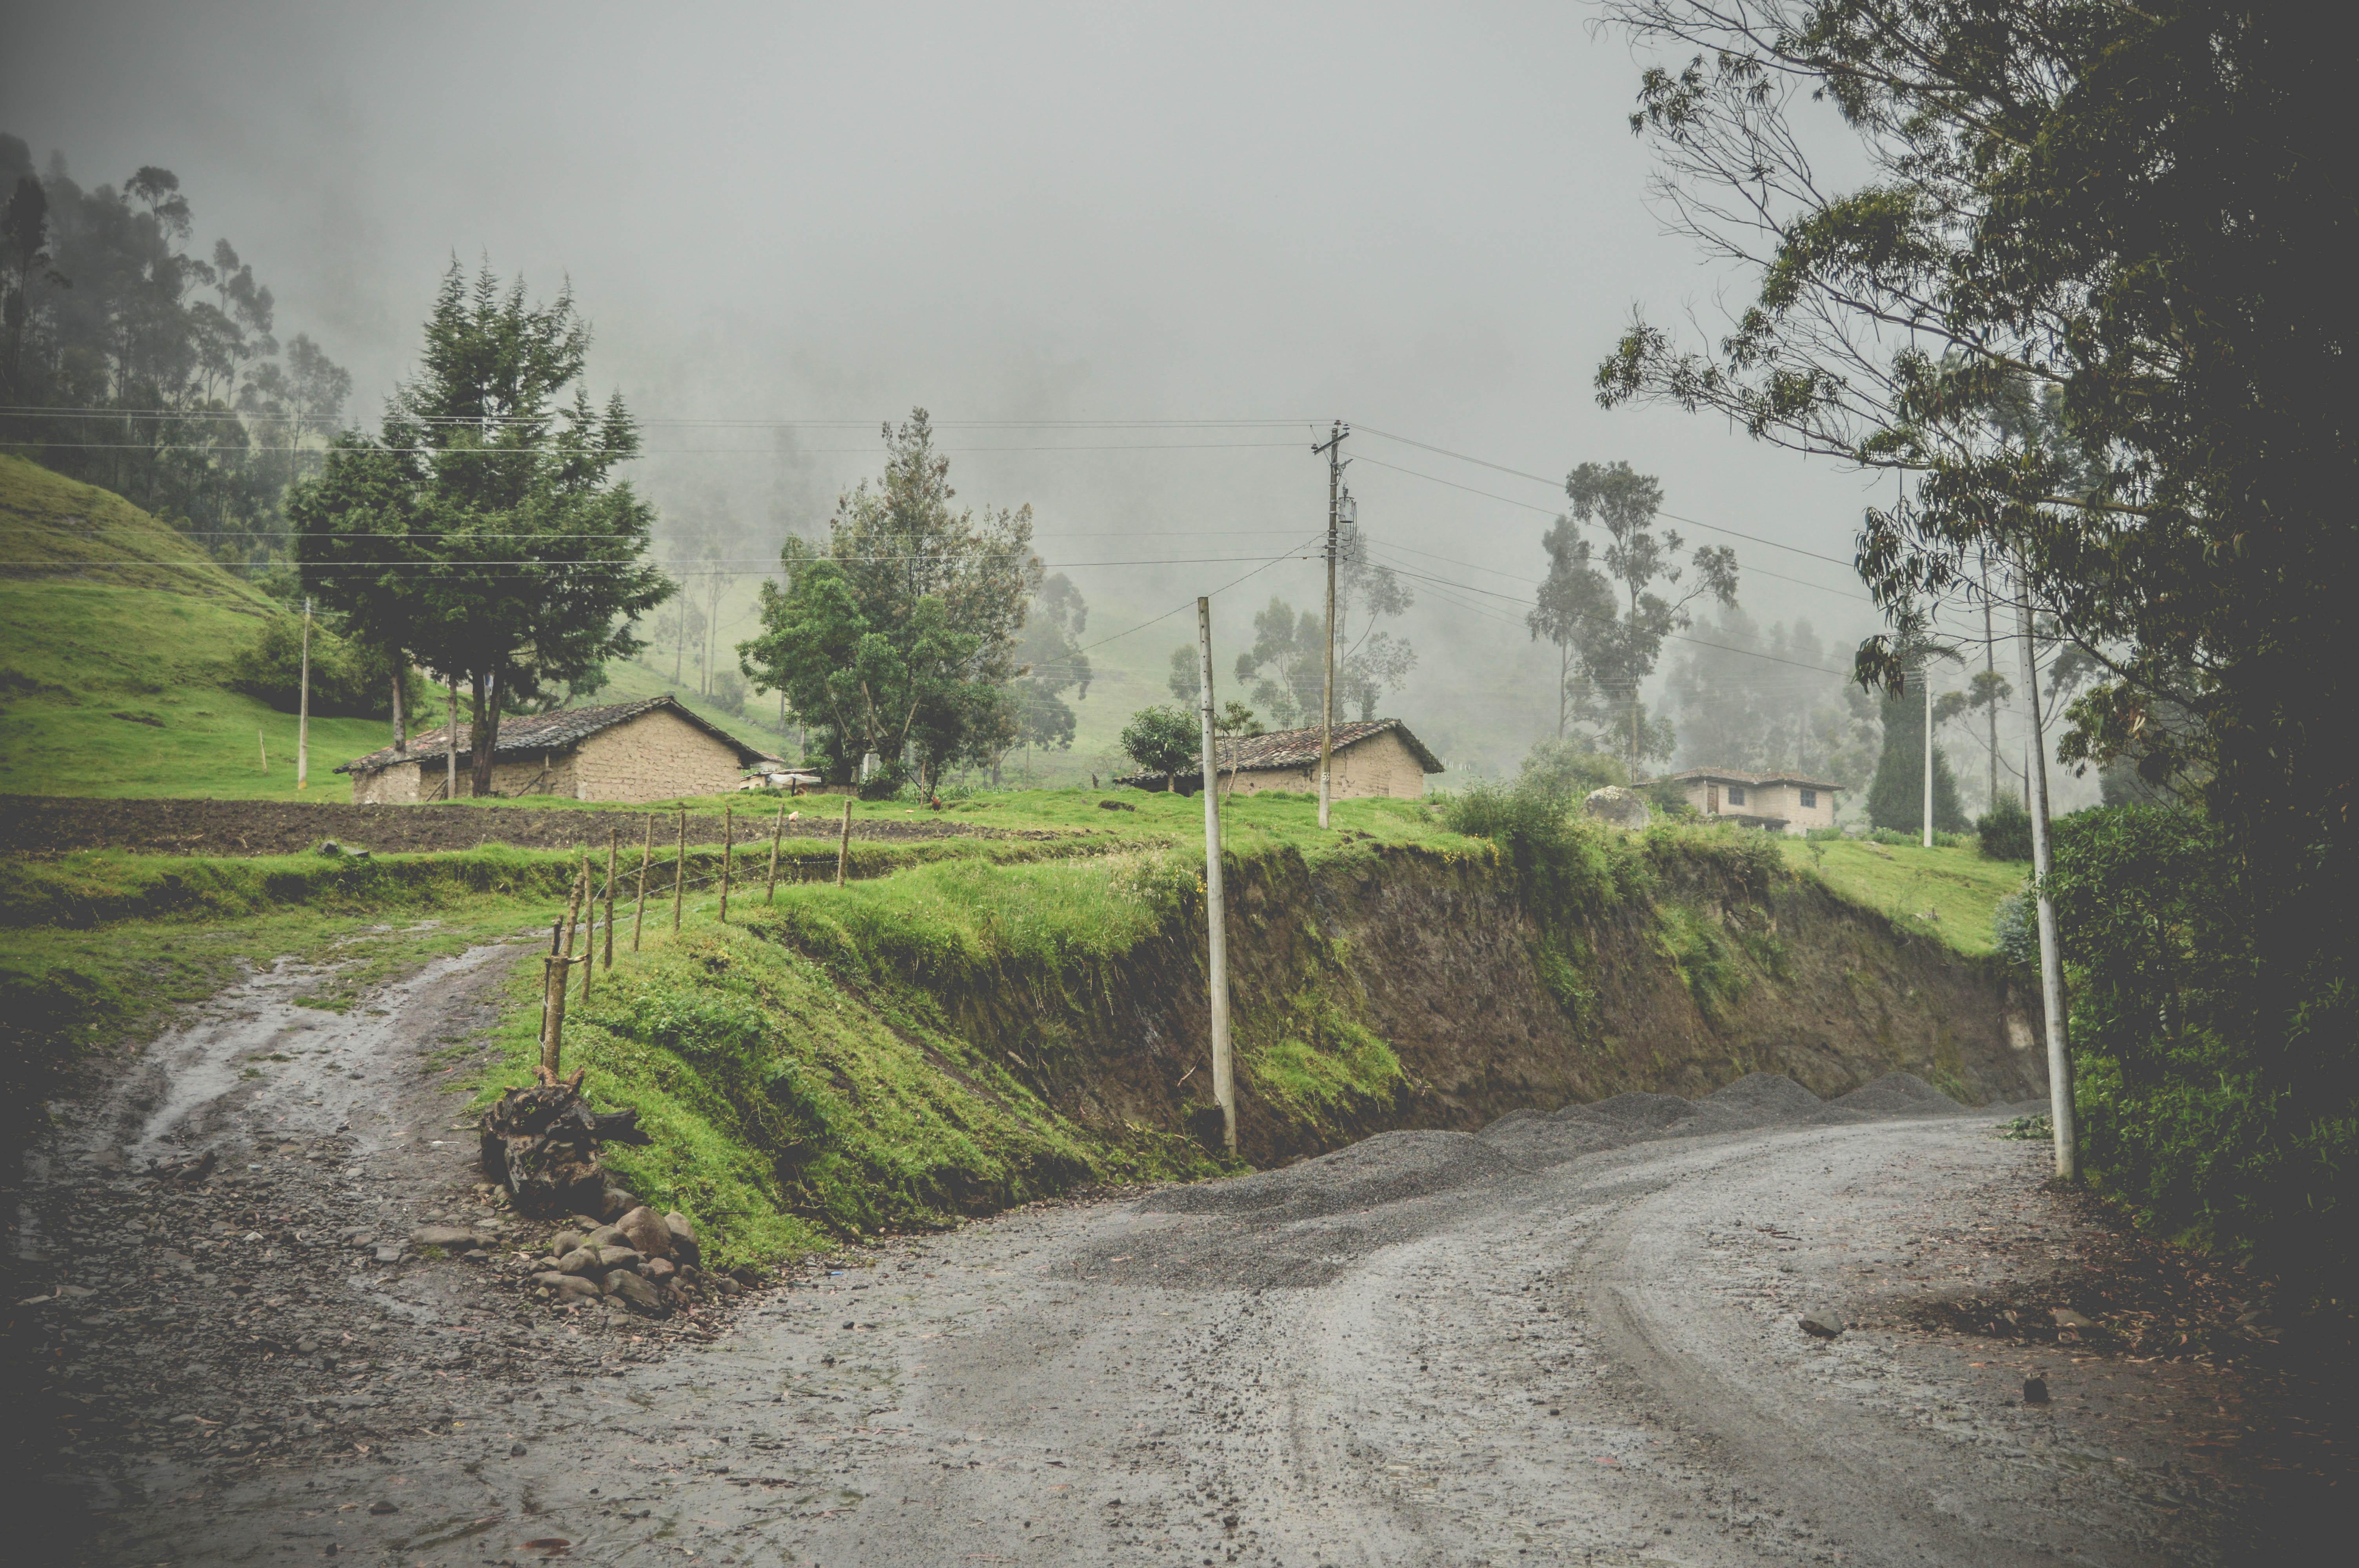 ruta ñan en bicicleta ecuador (4)